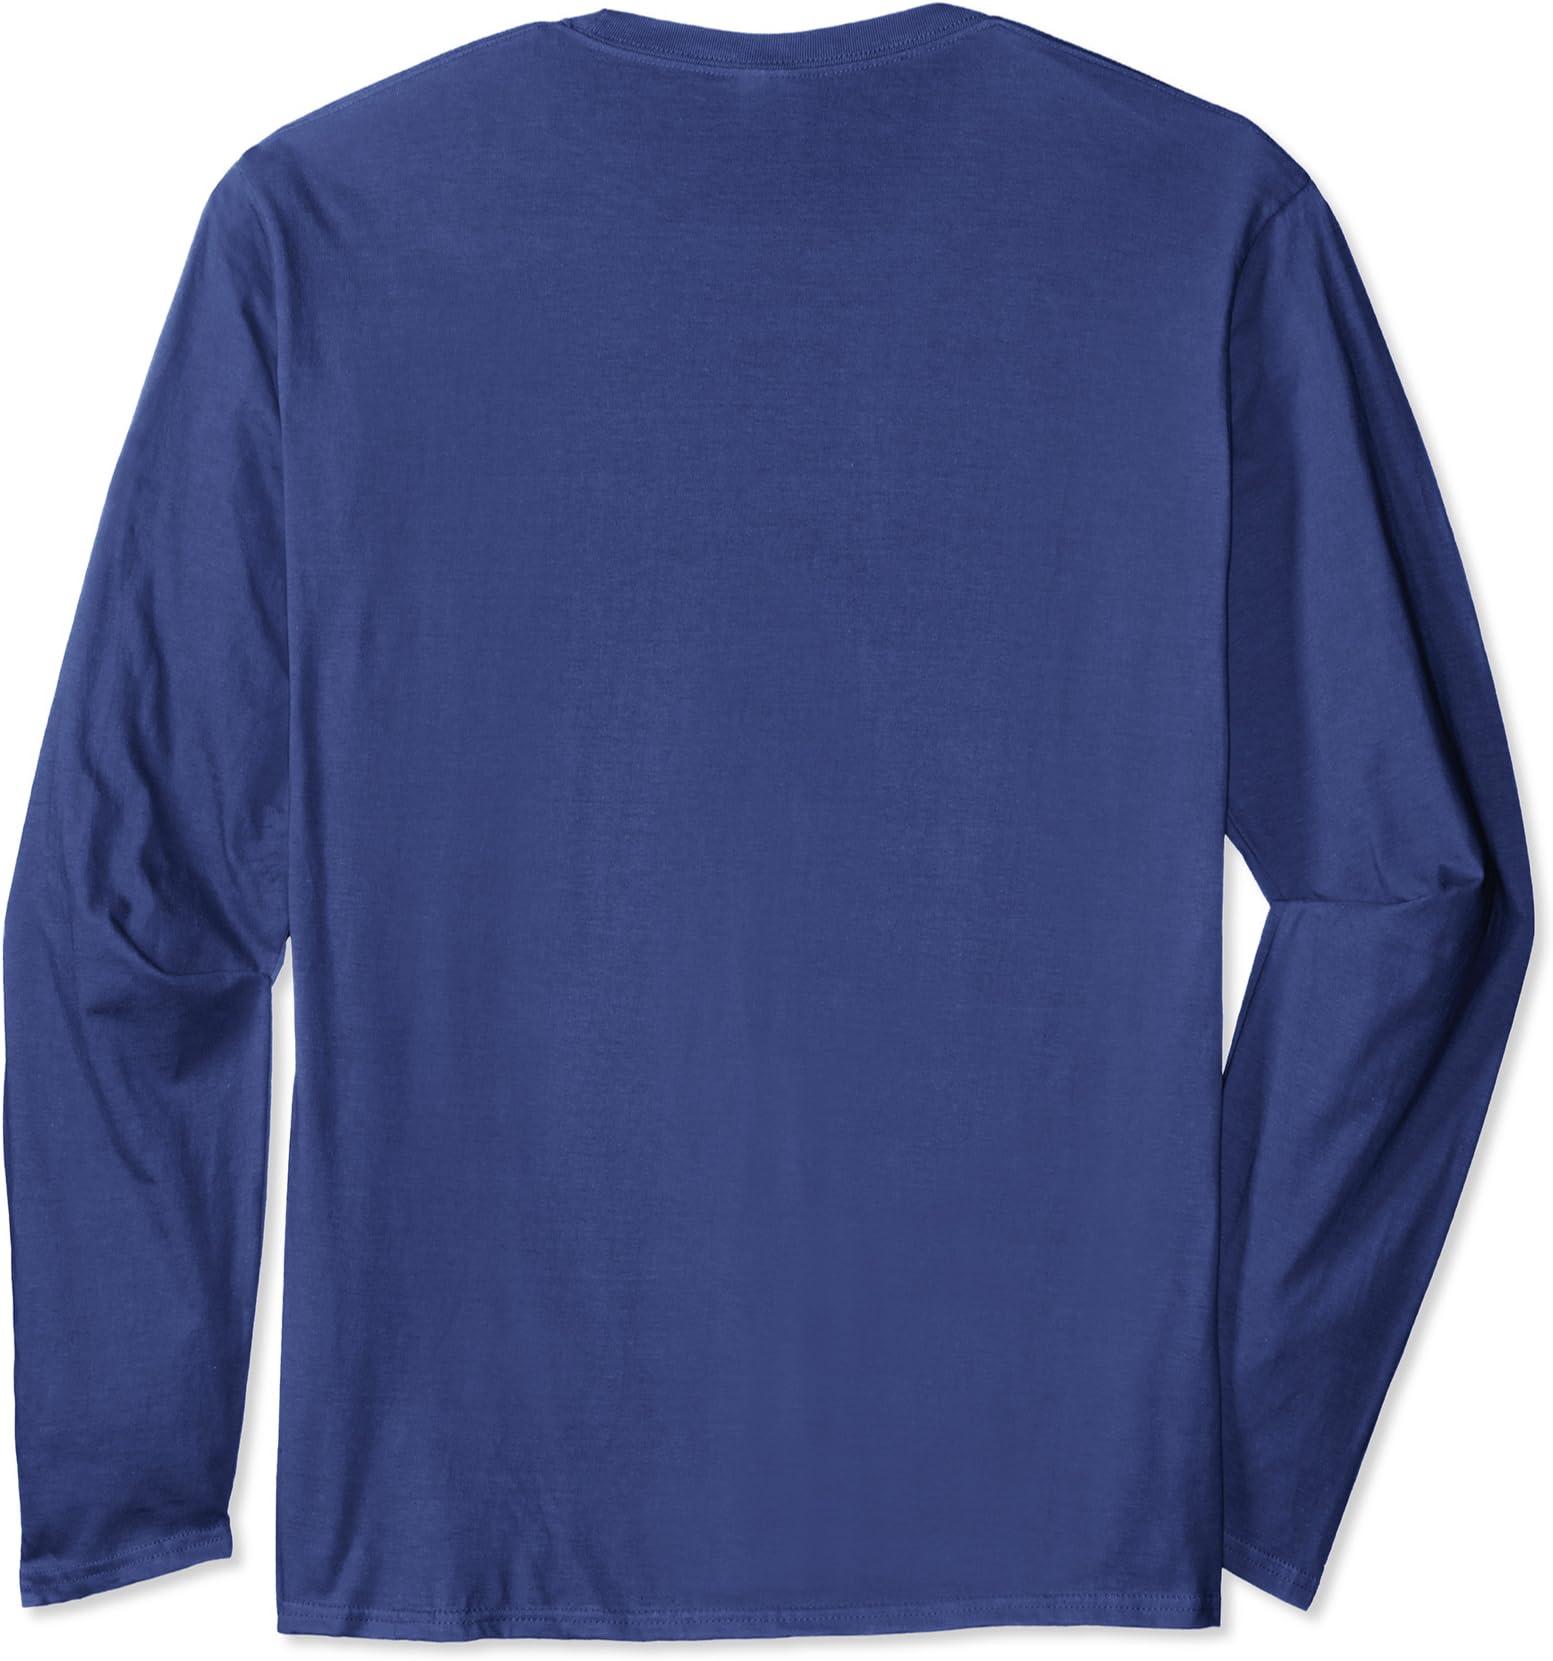 Unisex Smoke /'em Motorcycle Biker Skulls /& Bones Long Sleeve T Shirt  S to 2XL